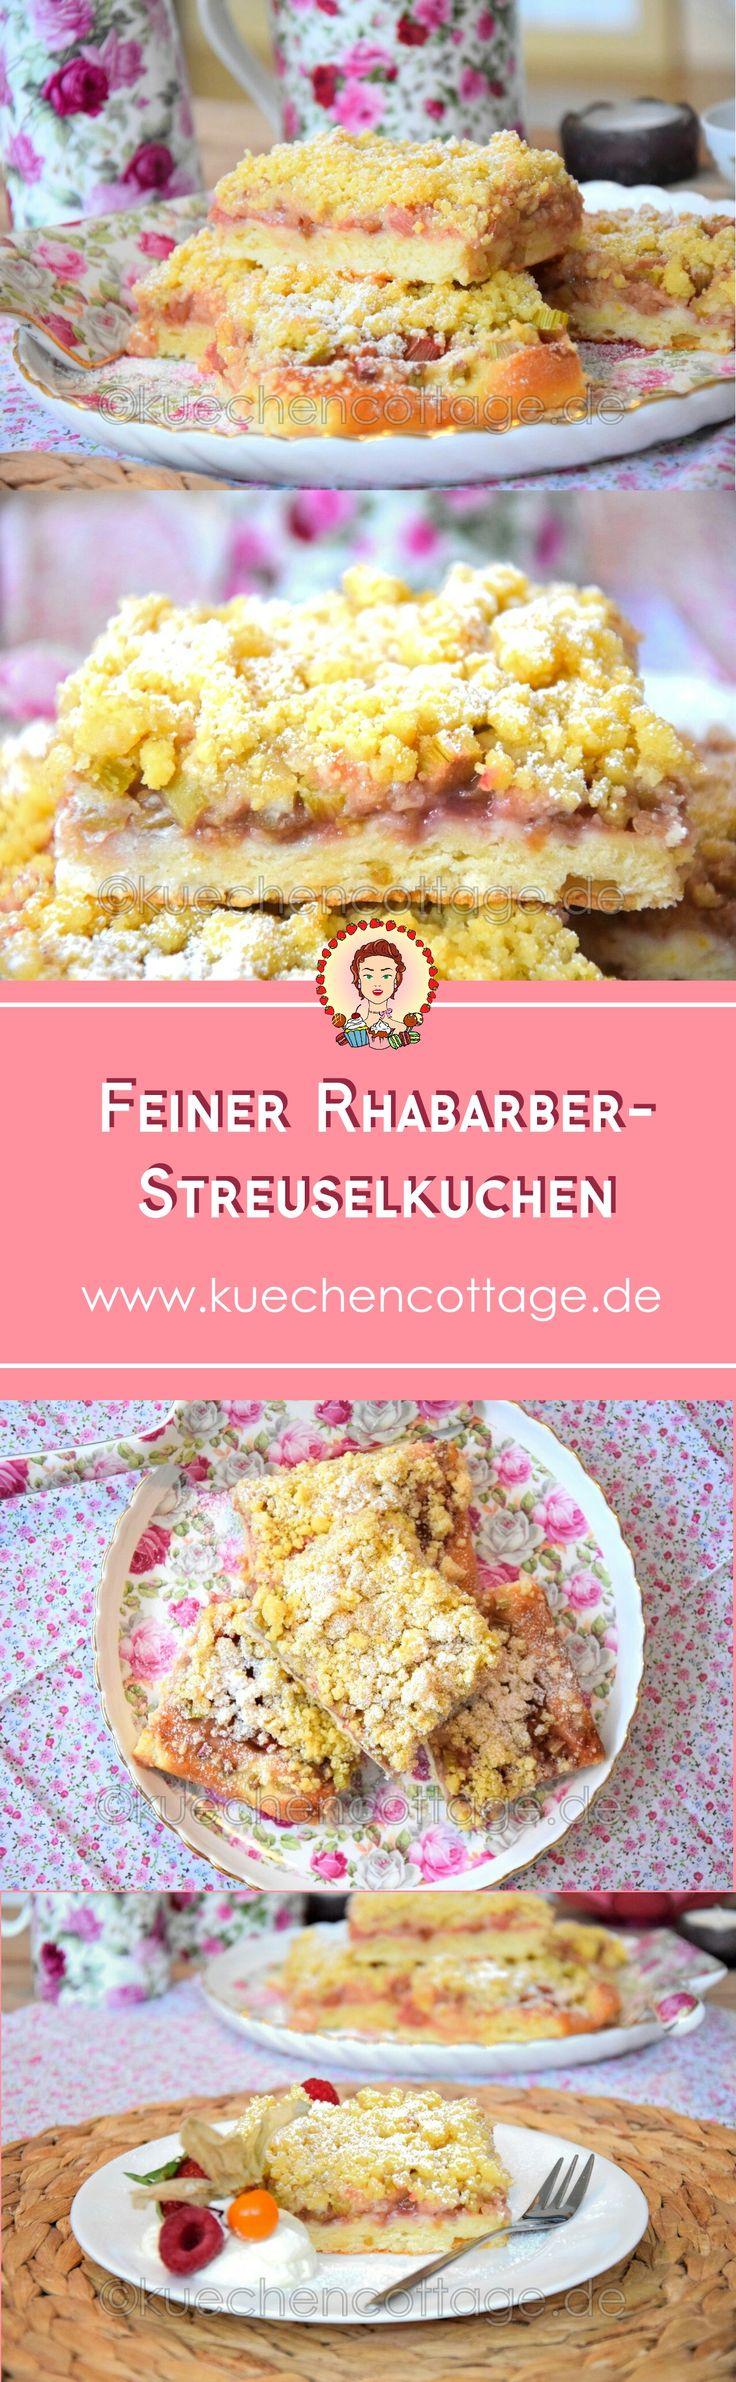 Feiner Rhabarber-Streuselkuchen | Küchencottage http://kuechencottage.de/rhabarber-streuselkuchen/ Das Rezept für den saftigen Rhabarber-Streuselkuchen gibt's bei kuechencottage.de!  #rhabarber #streuselkuchen #kuchen #backen #backenmitliebe #bakinglove #Rezept #Rezeptideen #Backideen #Blog #Foodblog #Backblog #Recipes #cake #foodporn #kuechencottage #sommer #frühling